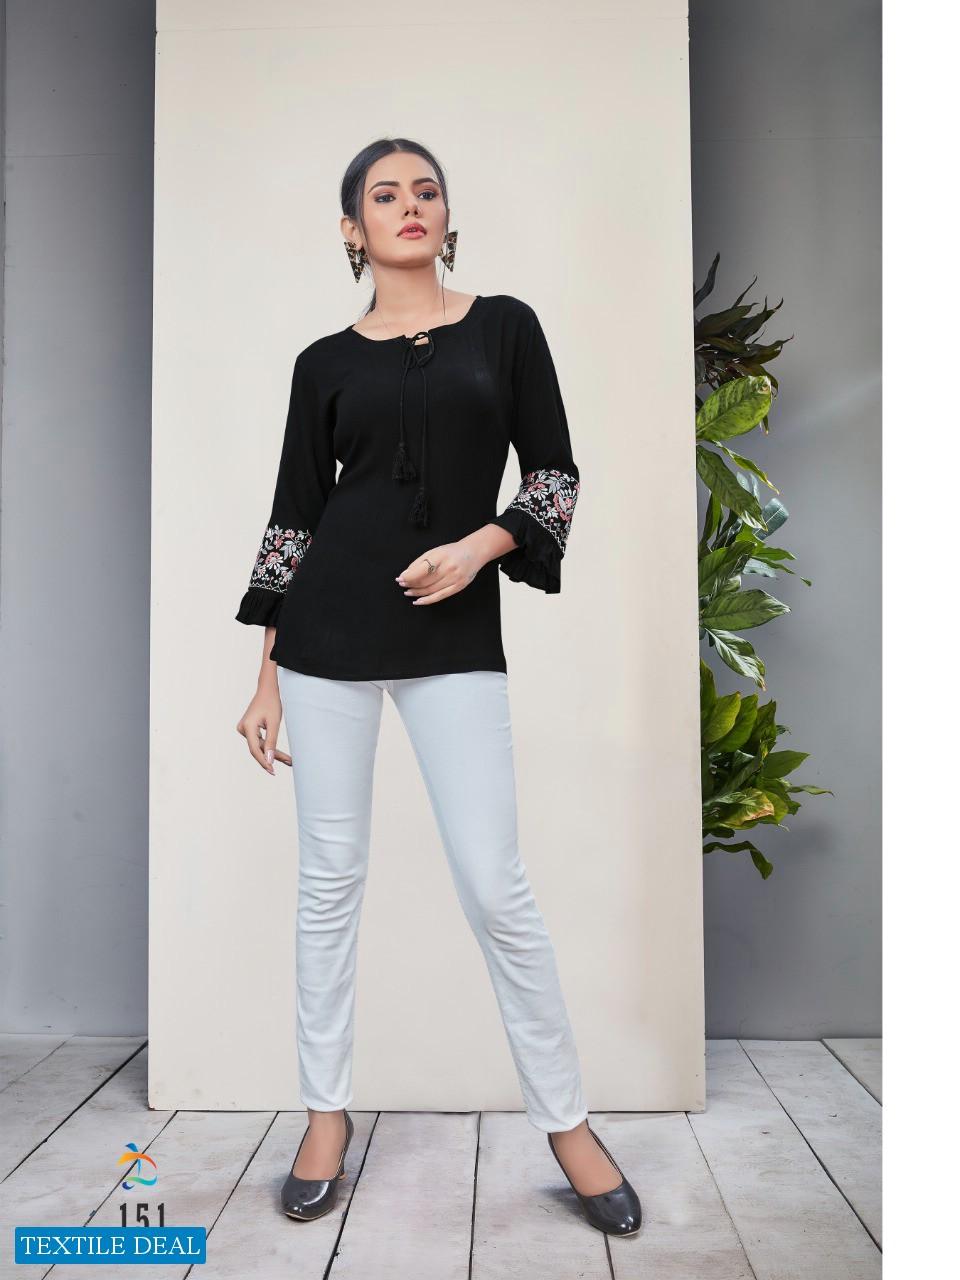 Dovi Fashion Ellen Wholesale Short Embroidered Tops